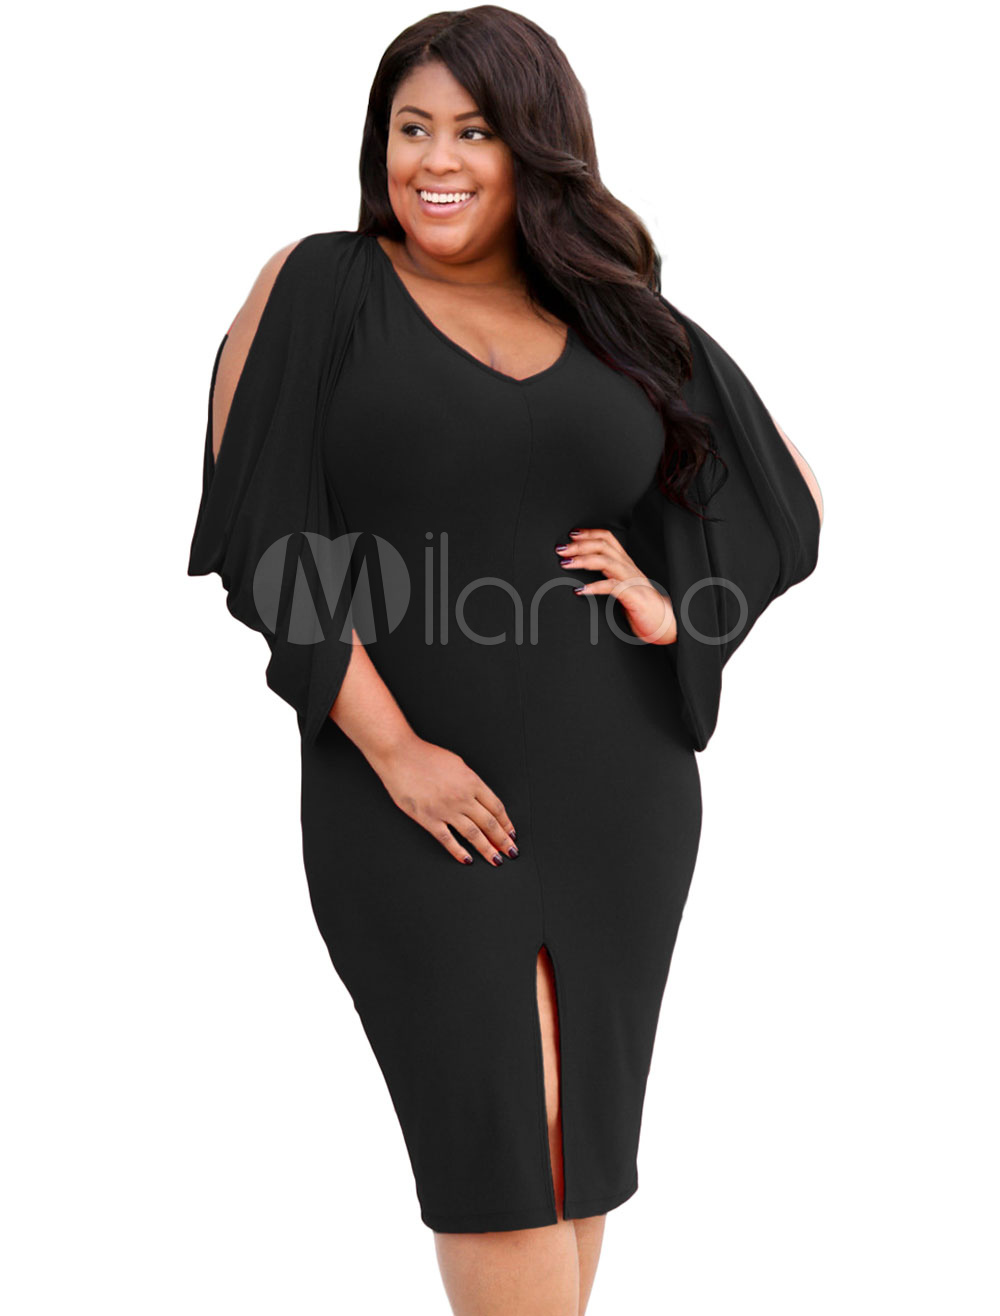 Plus Size Bodycon Dress Black V Neck Cold Shoulder Cut Out Sexy Mini Dress